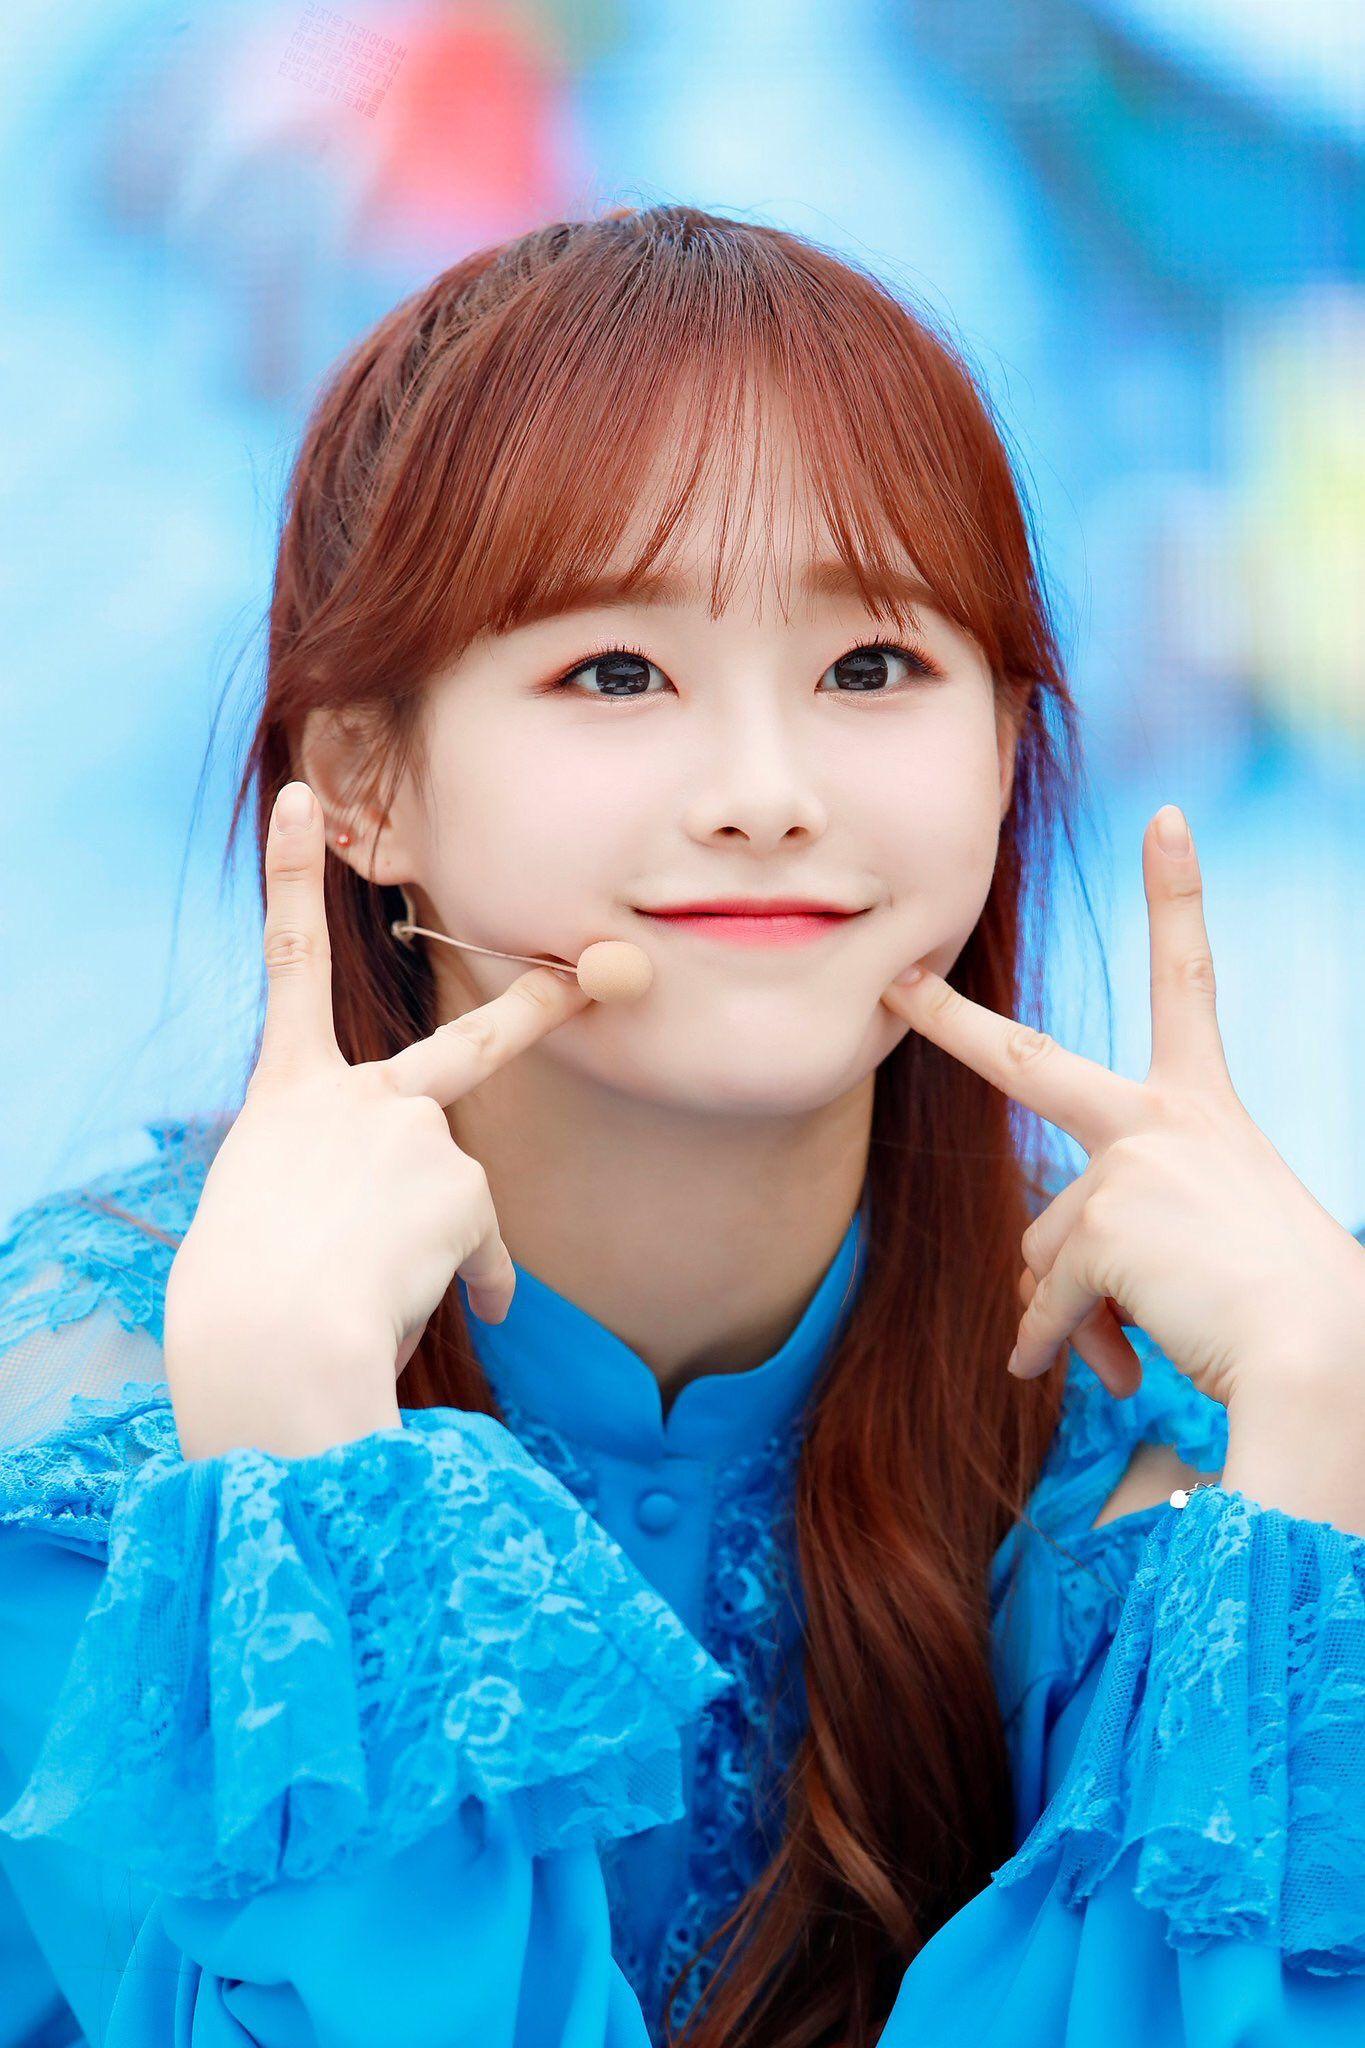 Loona Pics On Twitter Chuu Loona Pics Korean Idol